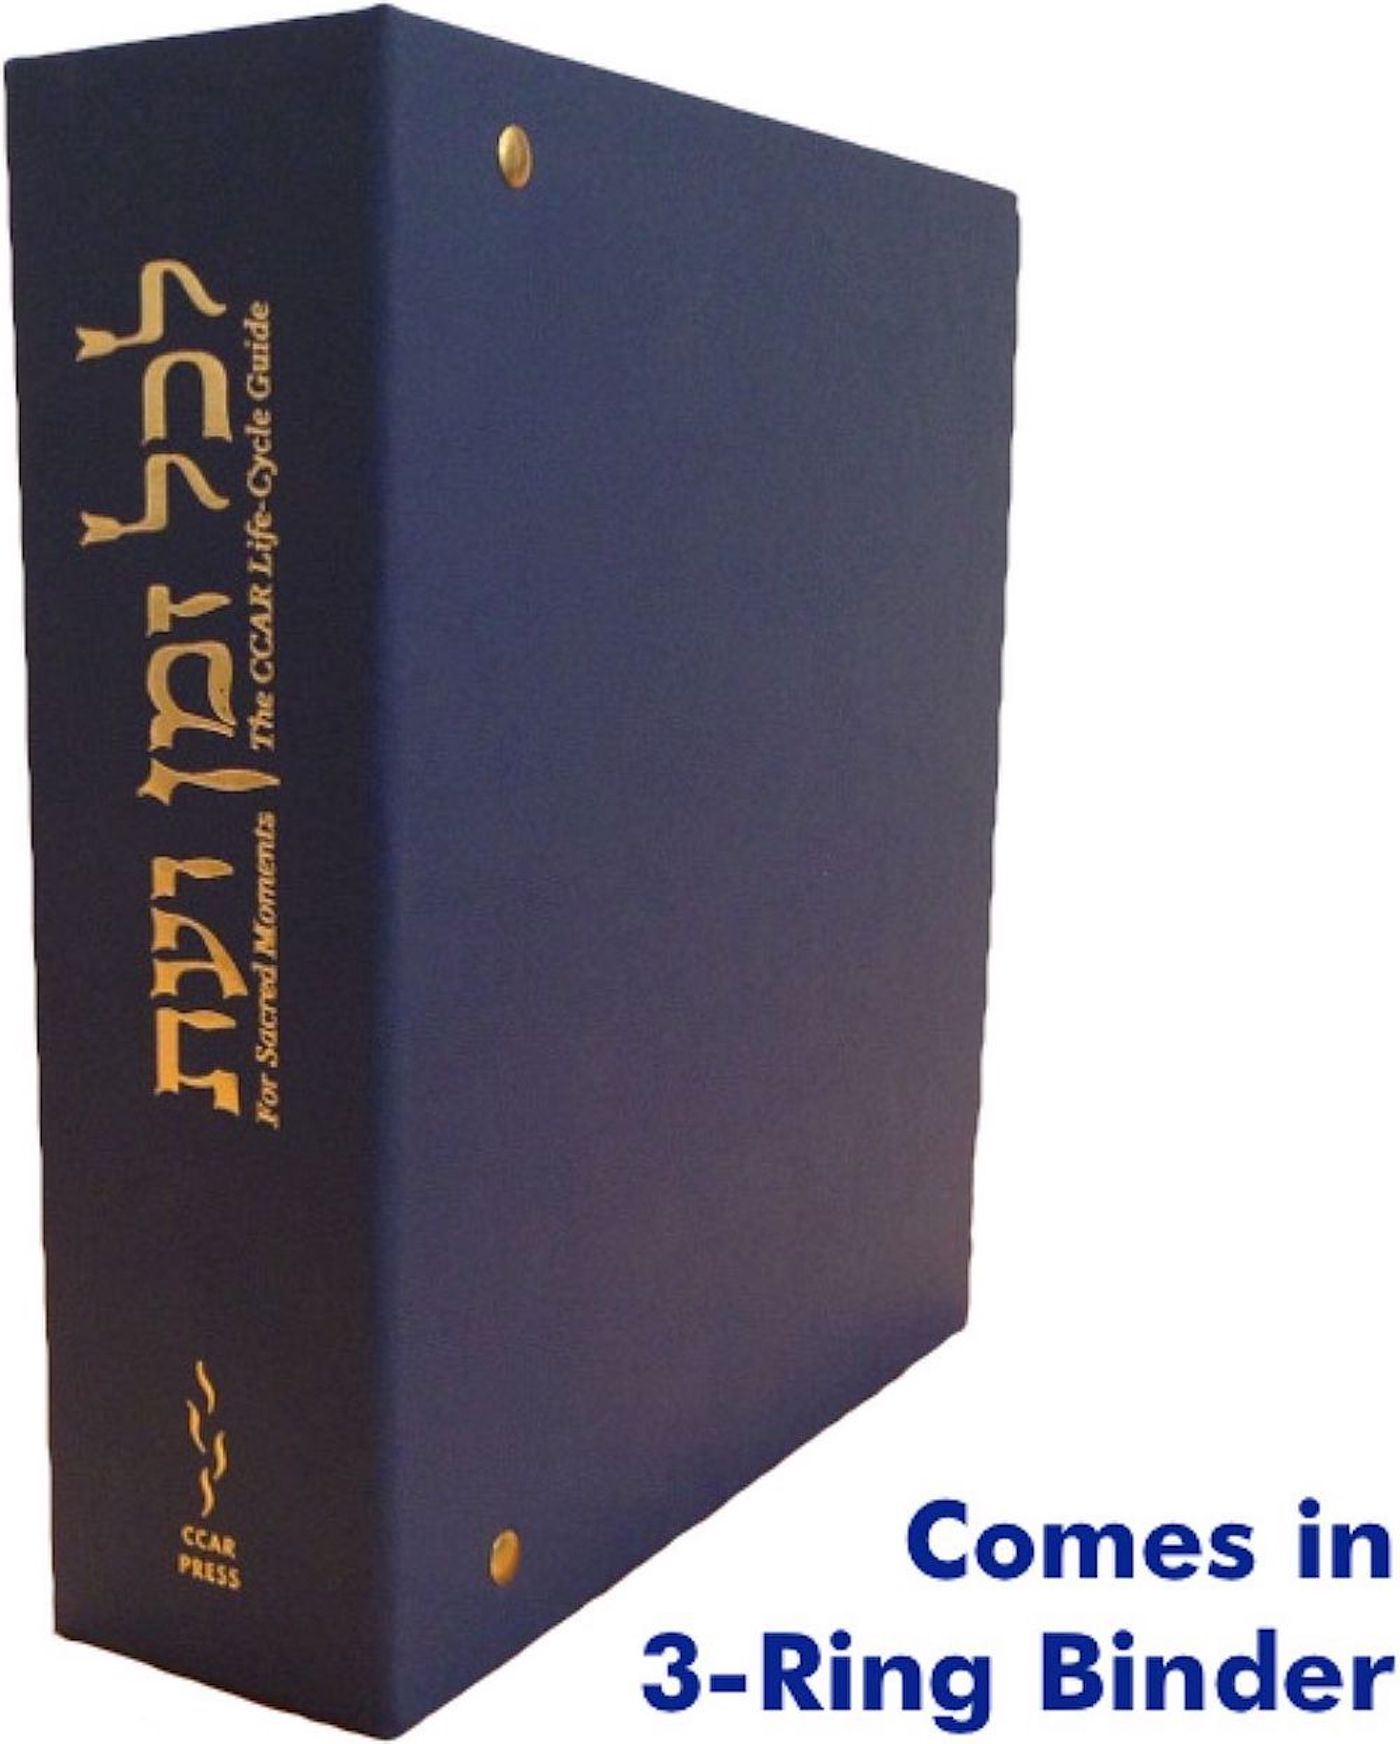 L'chol Z'man v'Eit: For Sacred Moments Book